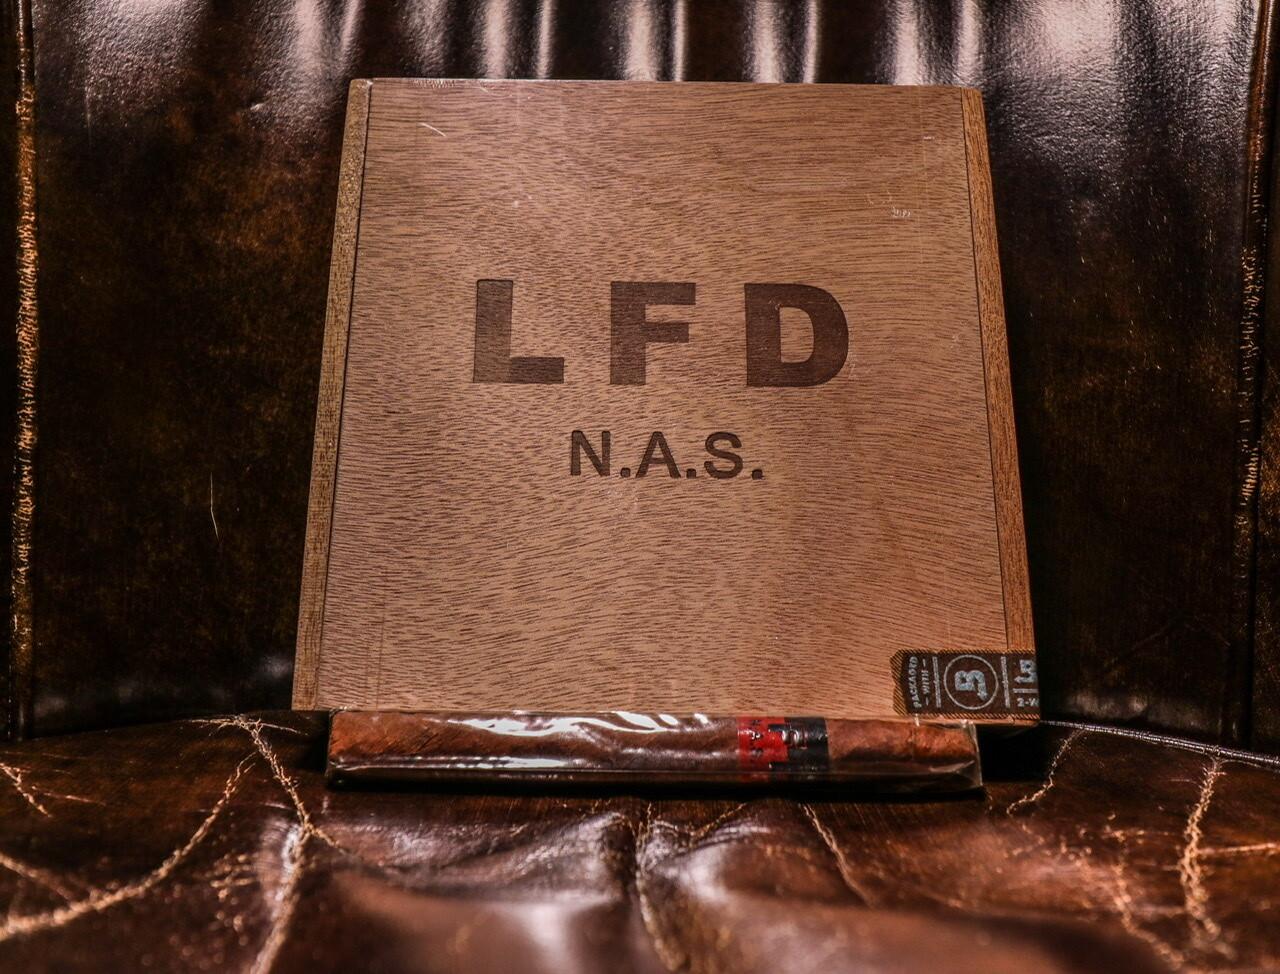 LFD NAS, 20's